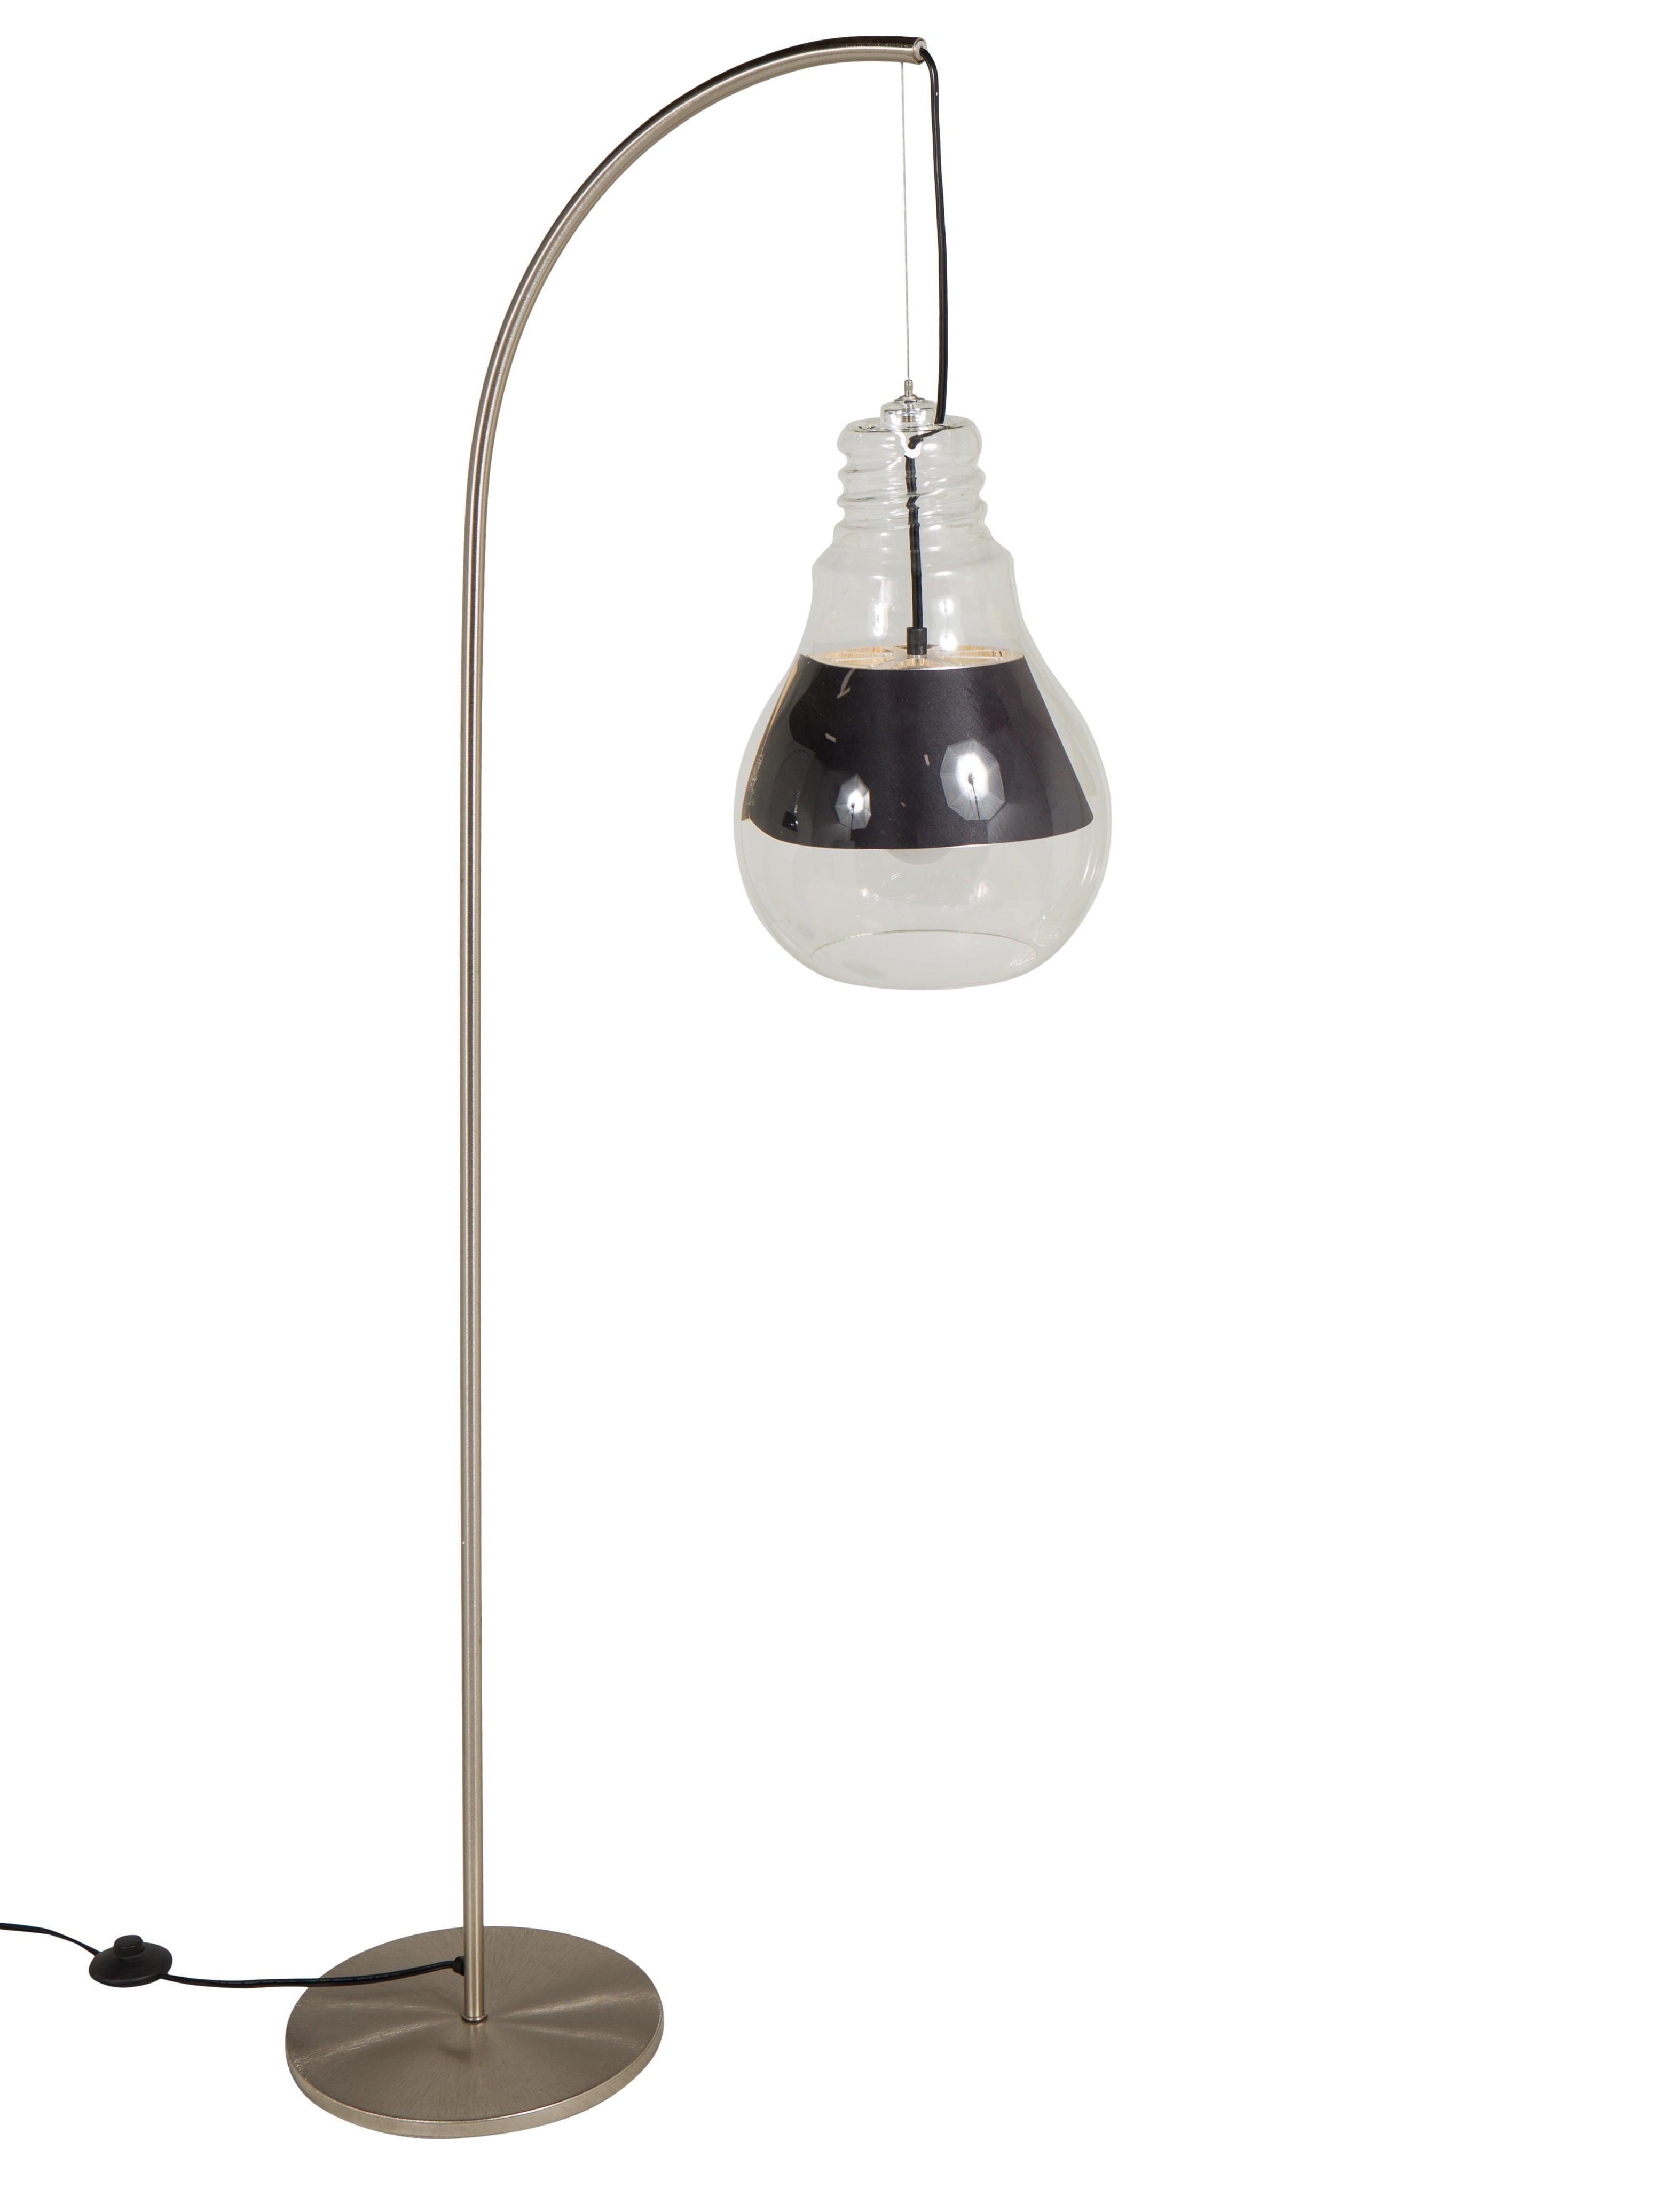 Roche Bobois Pair Of Floor Lamps Lighting BOB20026 The RealReal